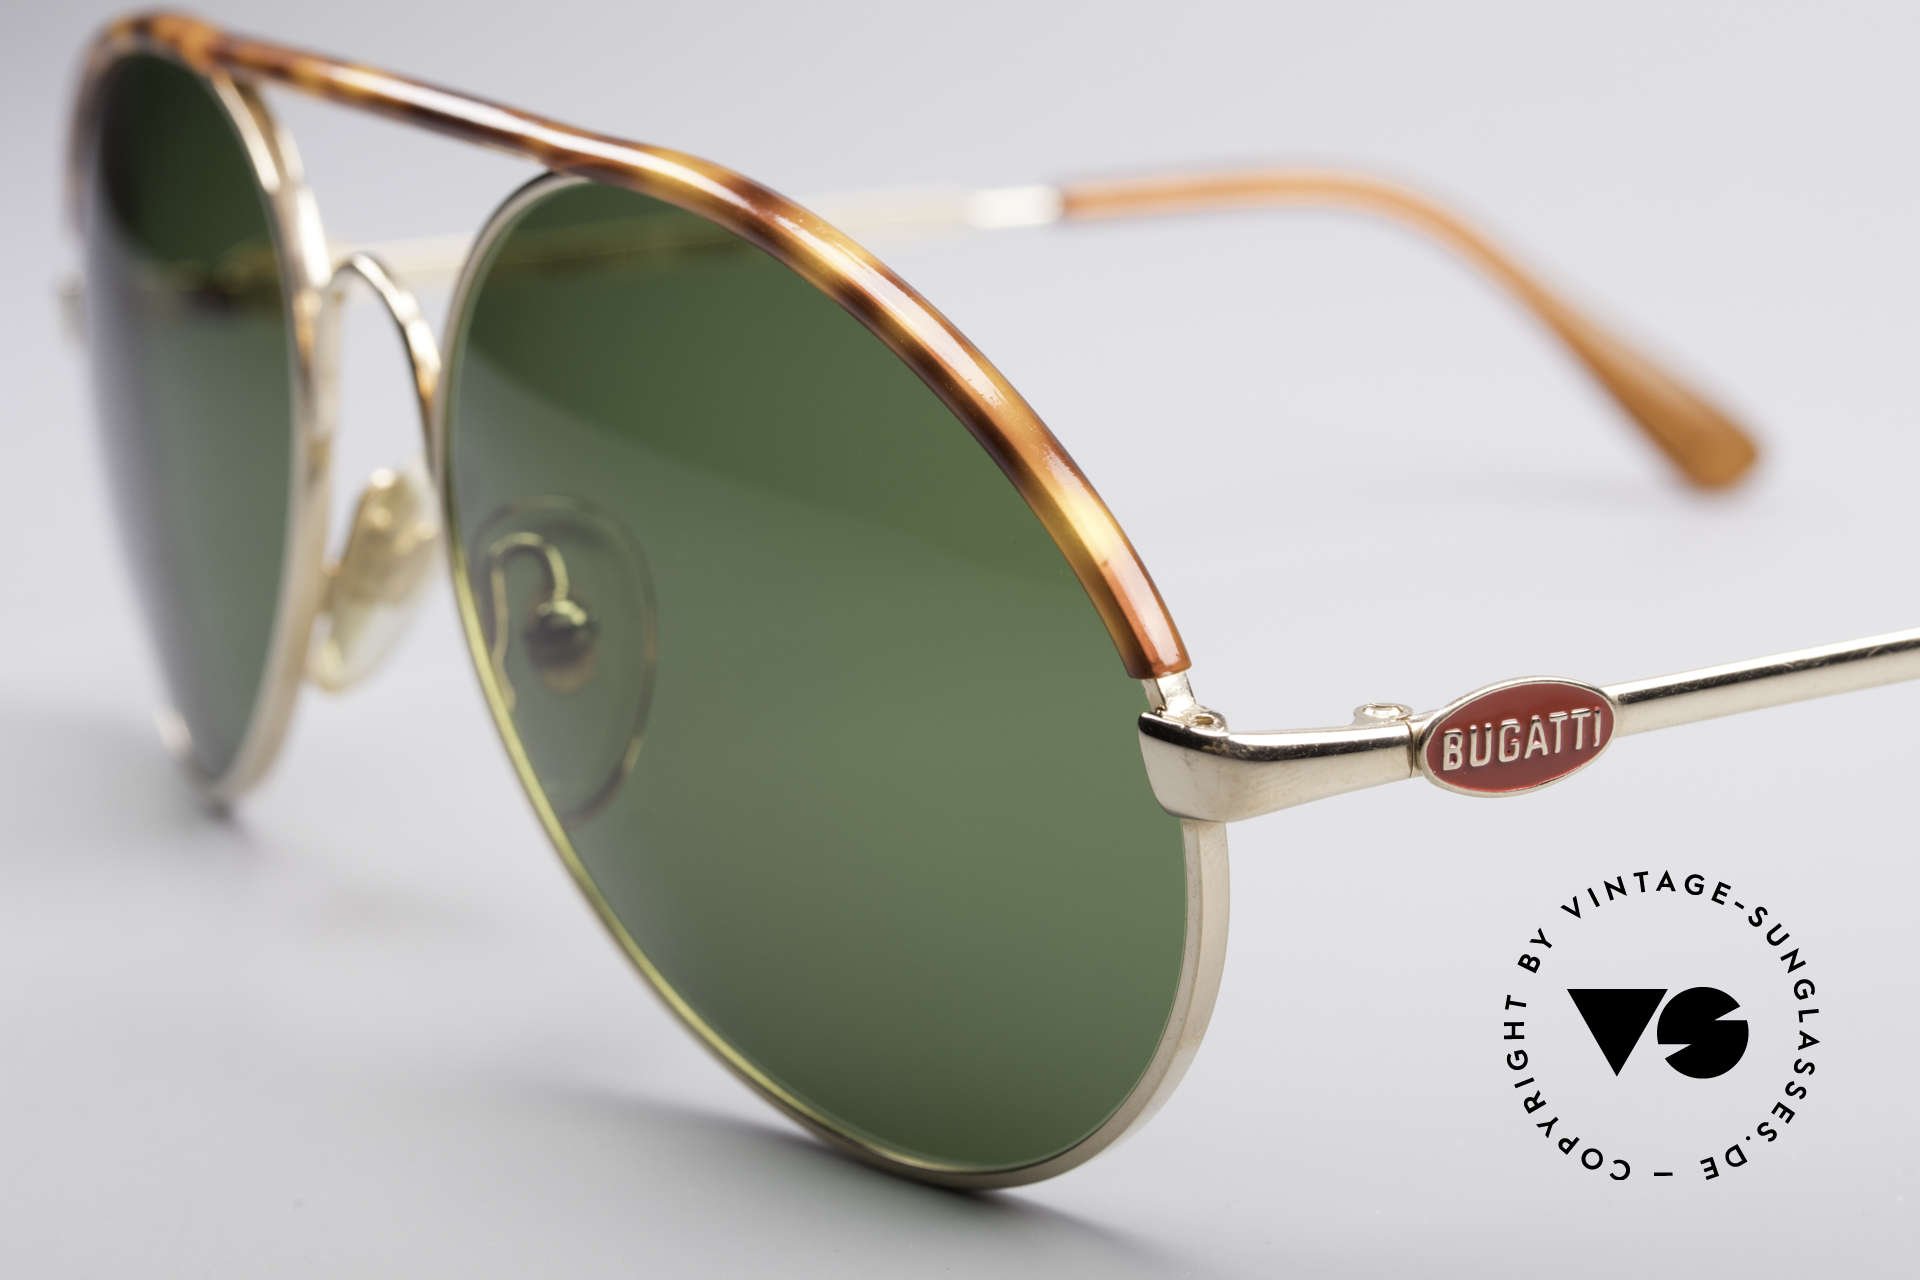 Bugatti 65986 Men's 80's Sunglasses, premium craftsmanship and LARGE size 56mm, Made for Men